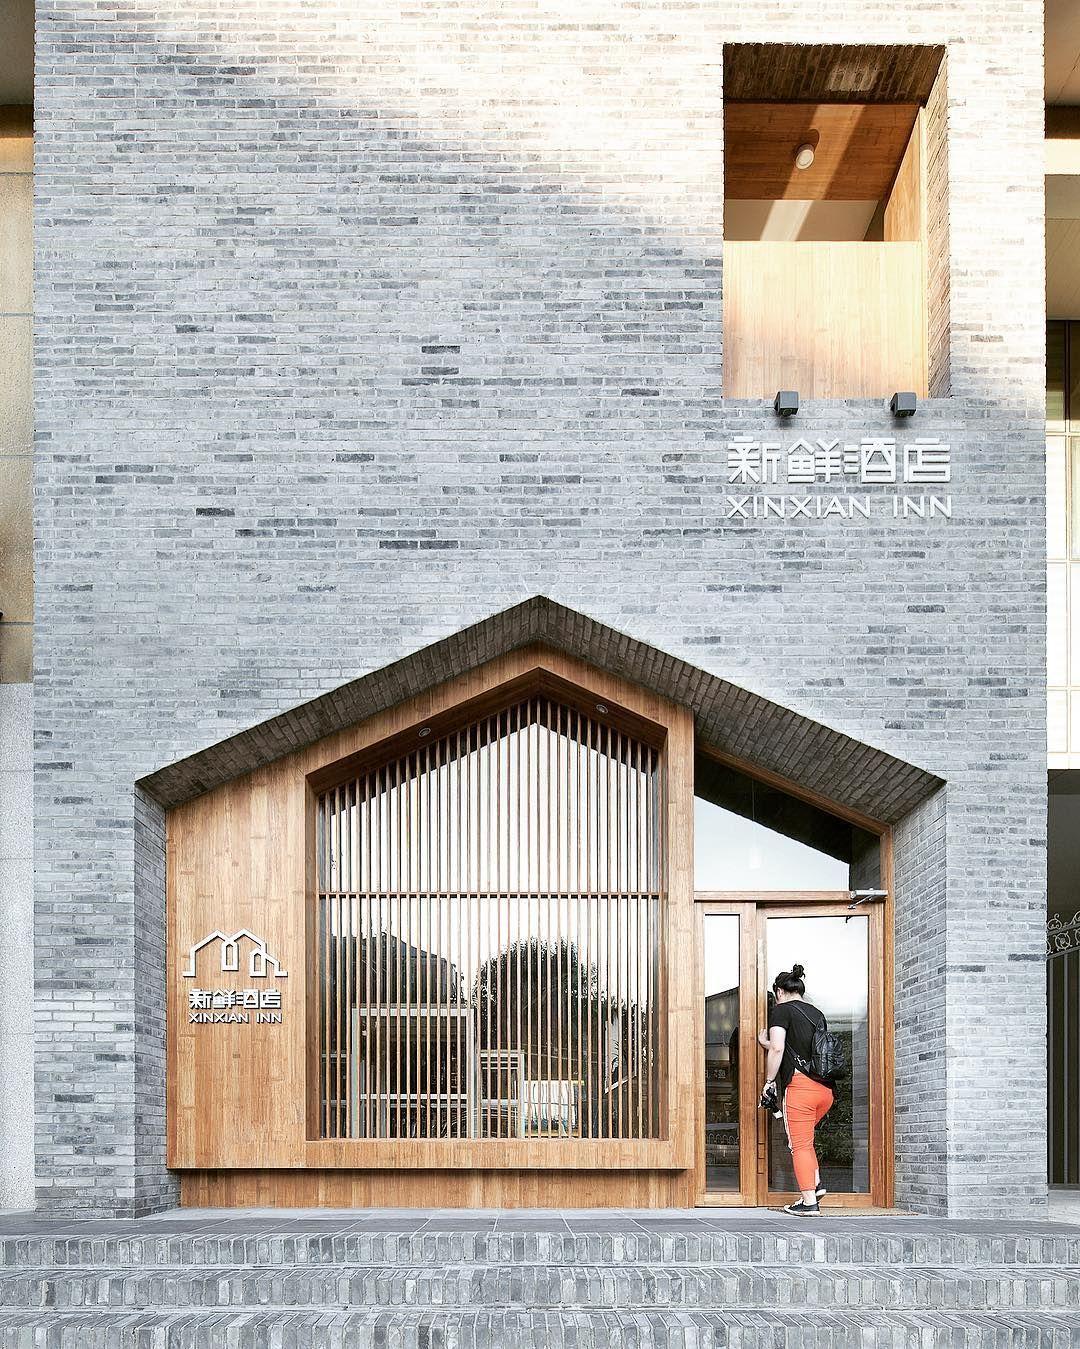 xinxian inn u0027 by penda dailypenda our newest hotel in beijing